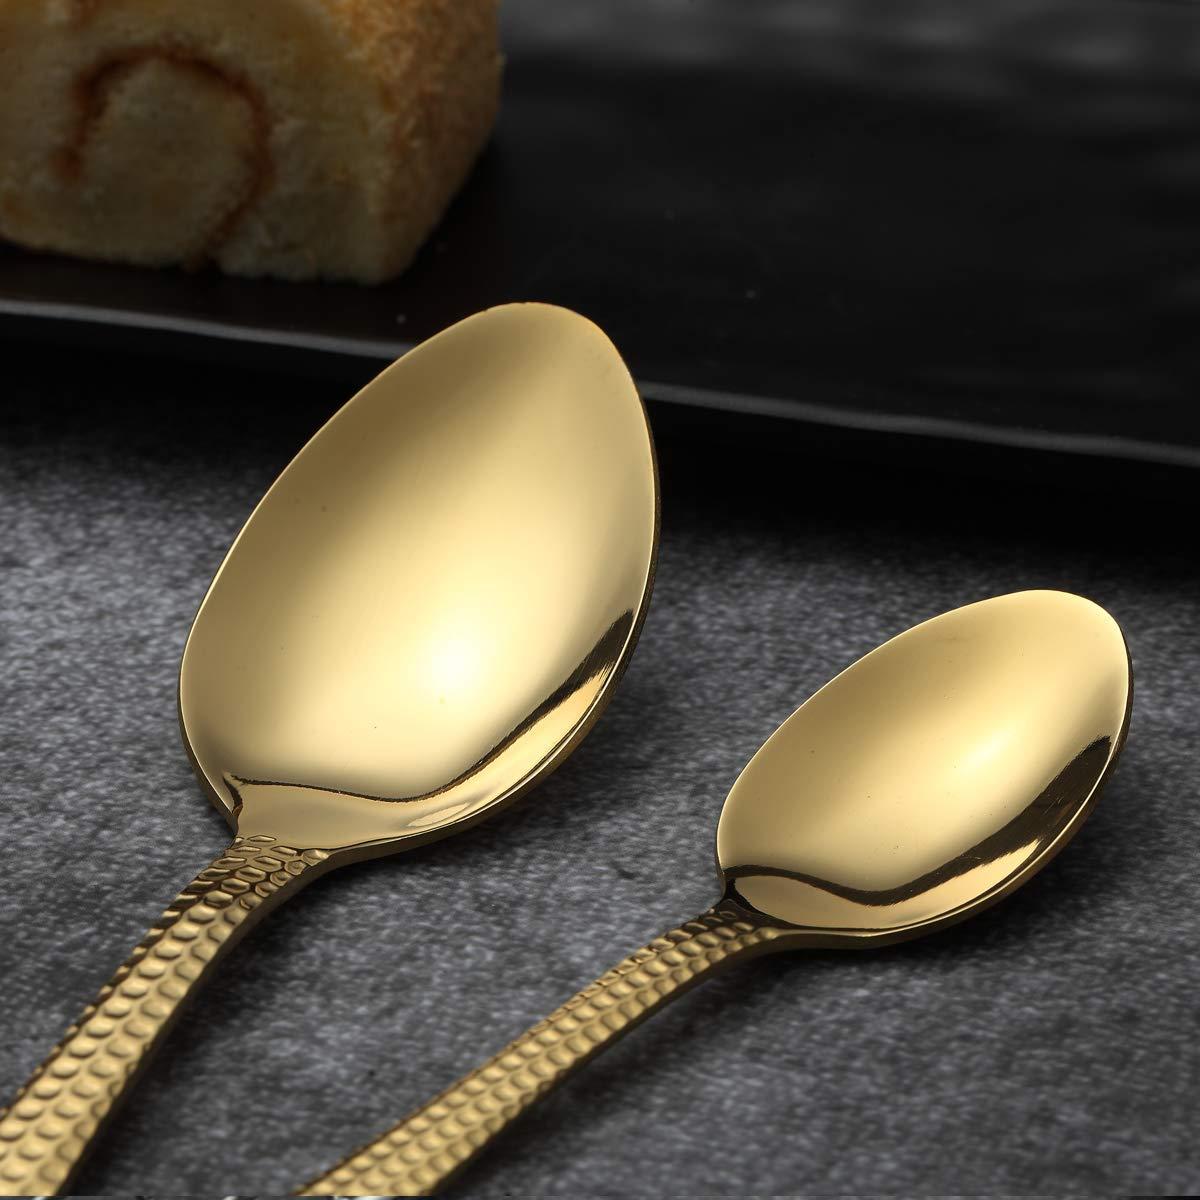 Golden Cutlery Set shiny Gold Service for 4 Berglander 20 Piece Titanium Gold Plated Stainless Steel Flatware Set 20 Pieces Golden Silverware Set